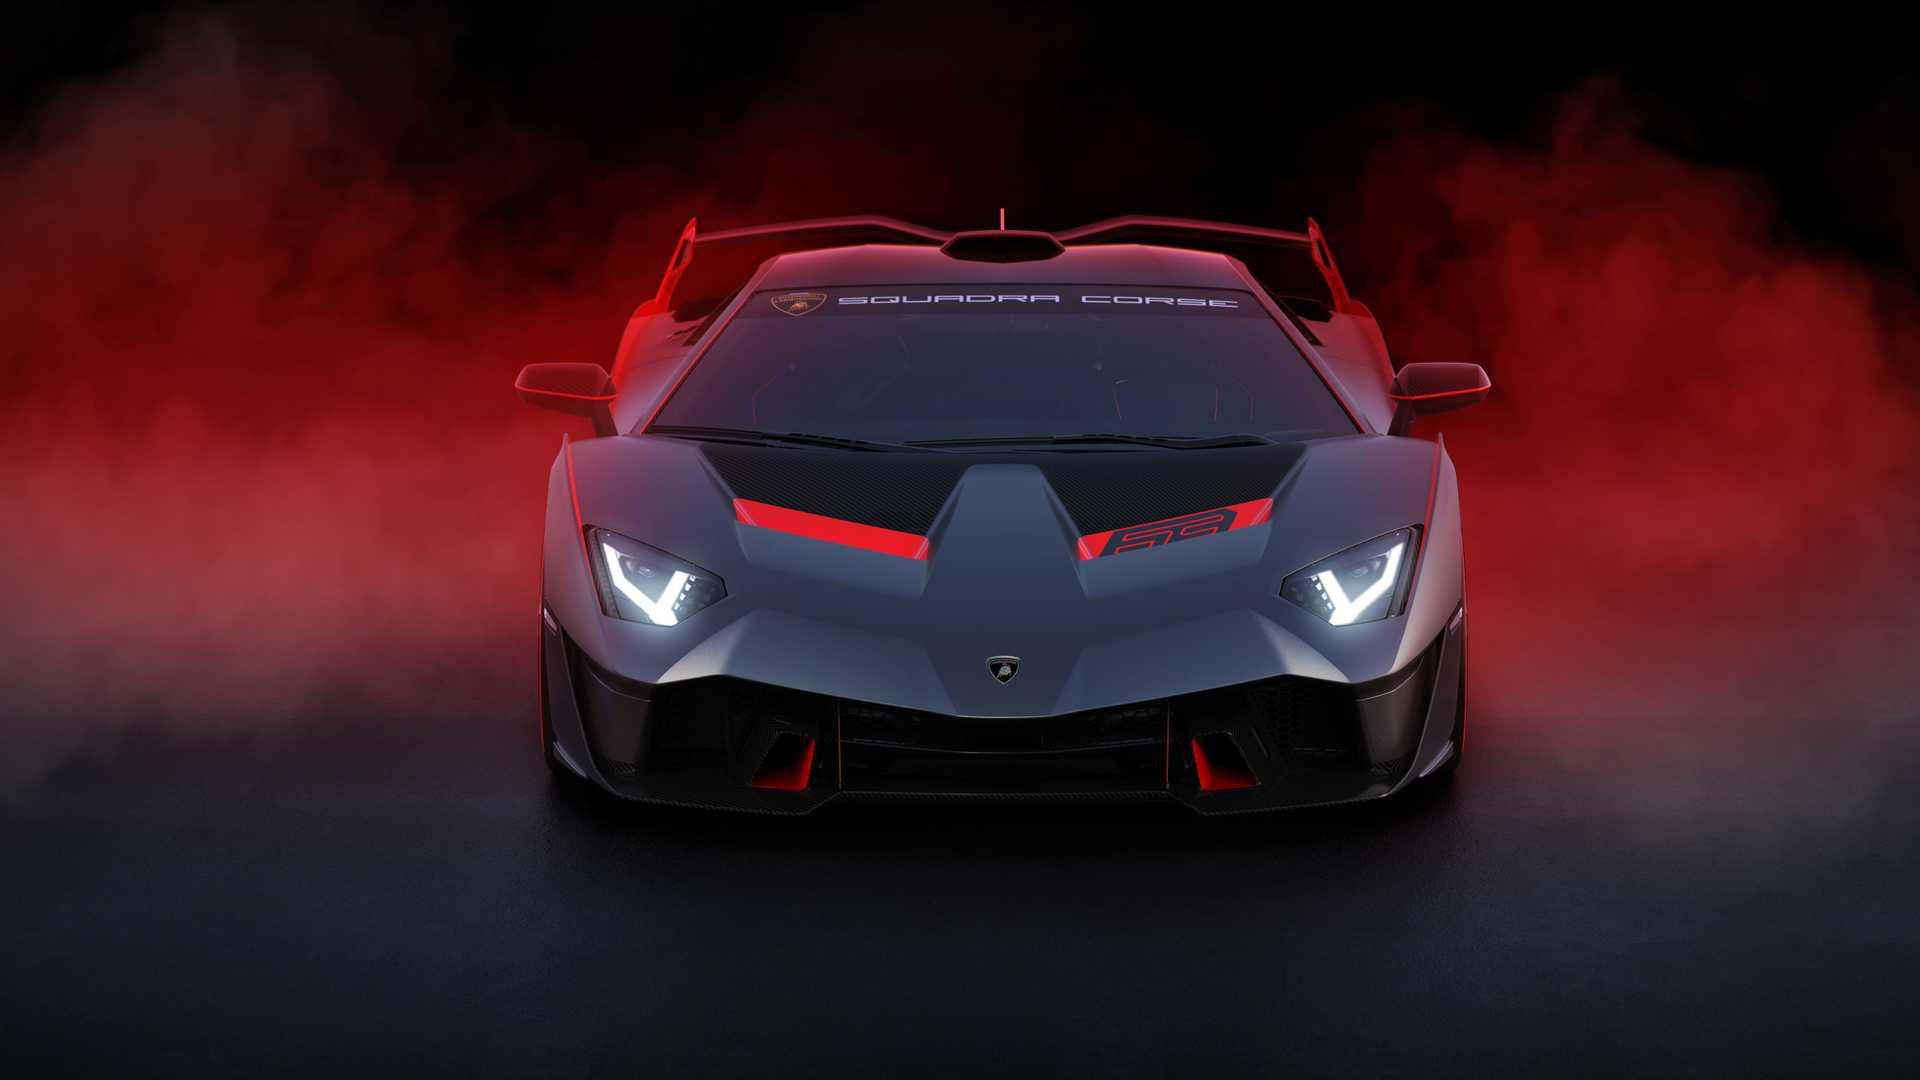 2019 Lamborghini SC18 Alston Front Wallpapers (11)